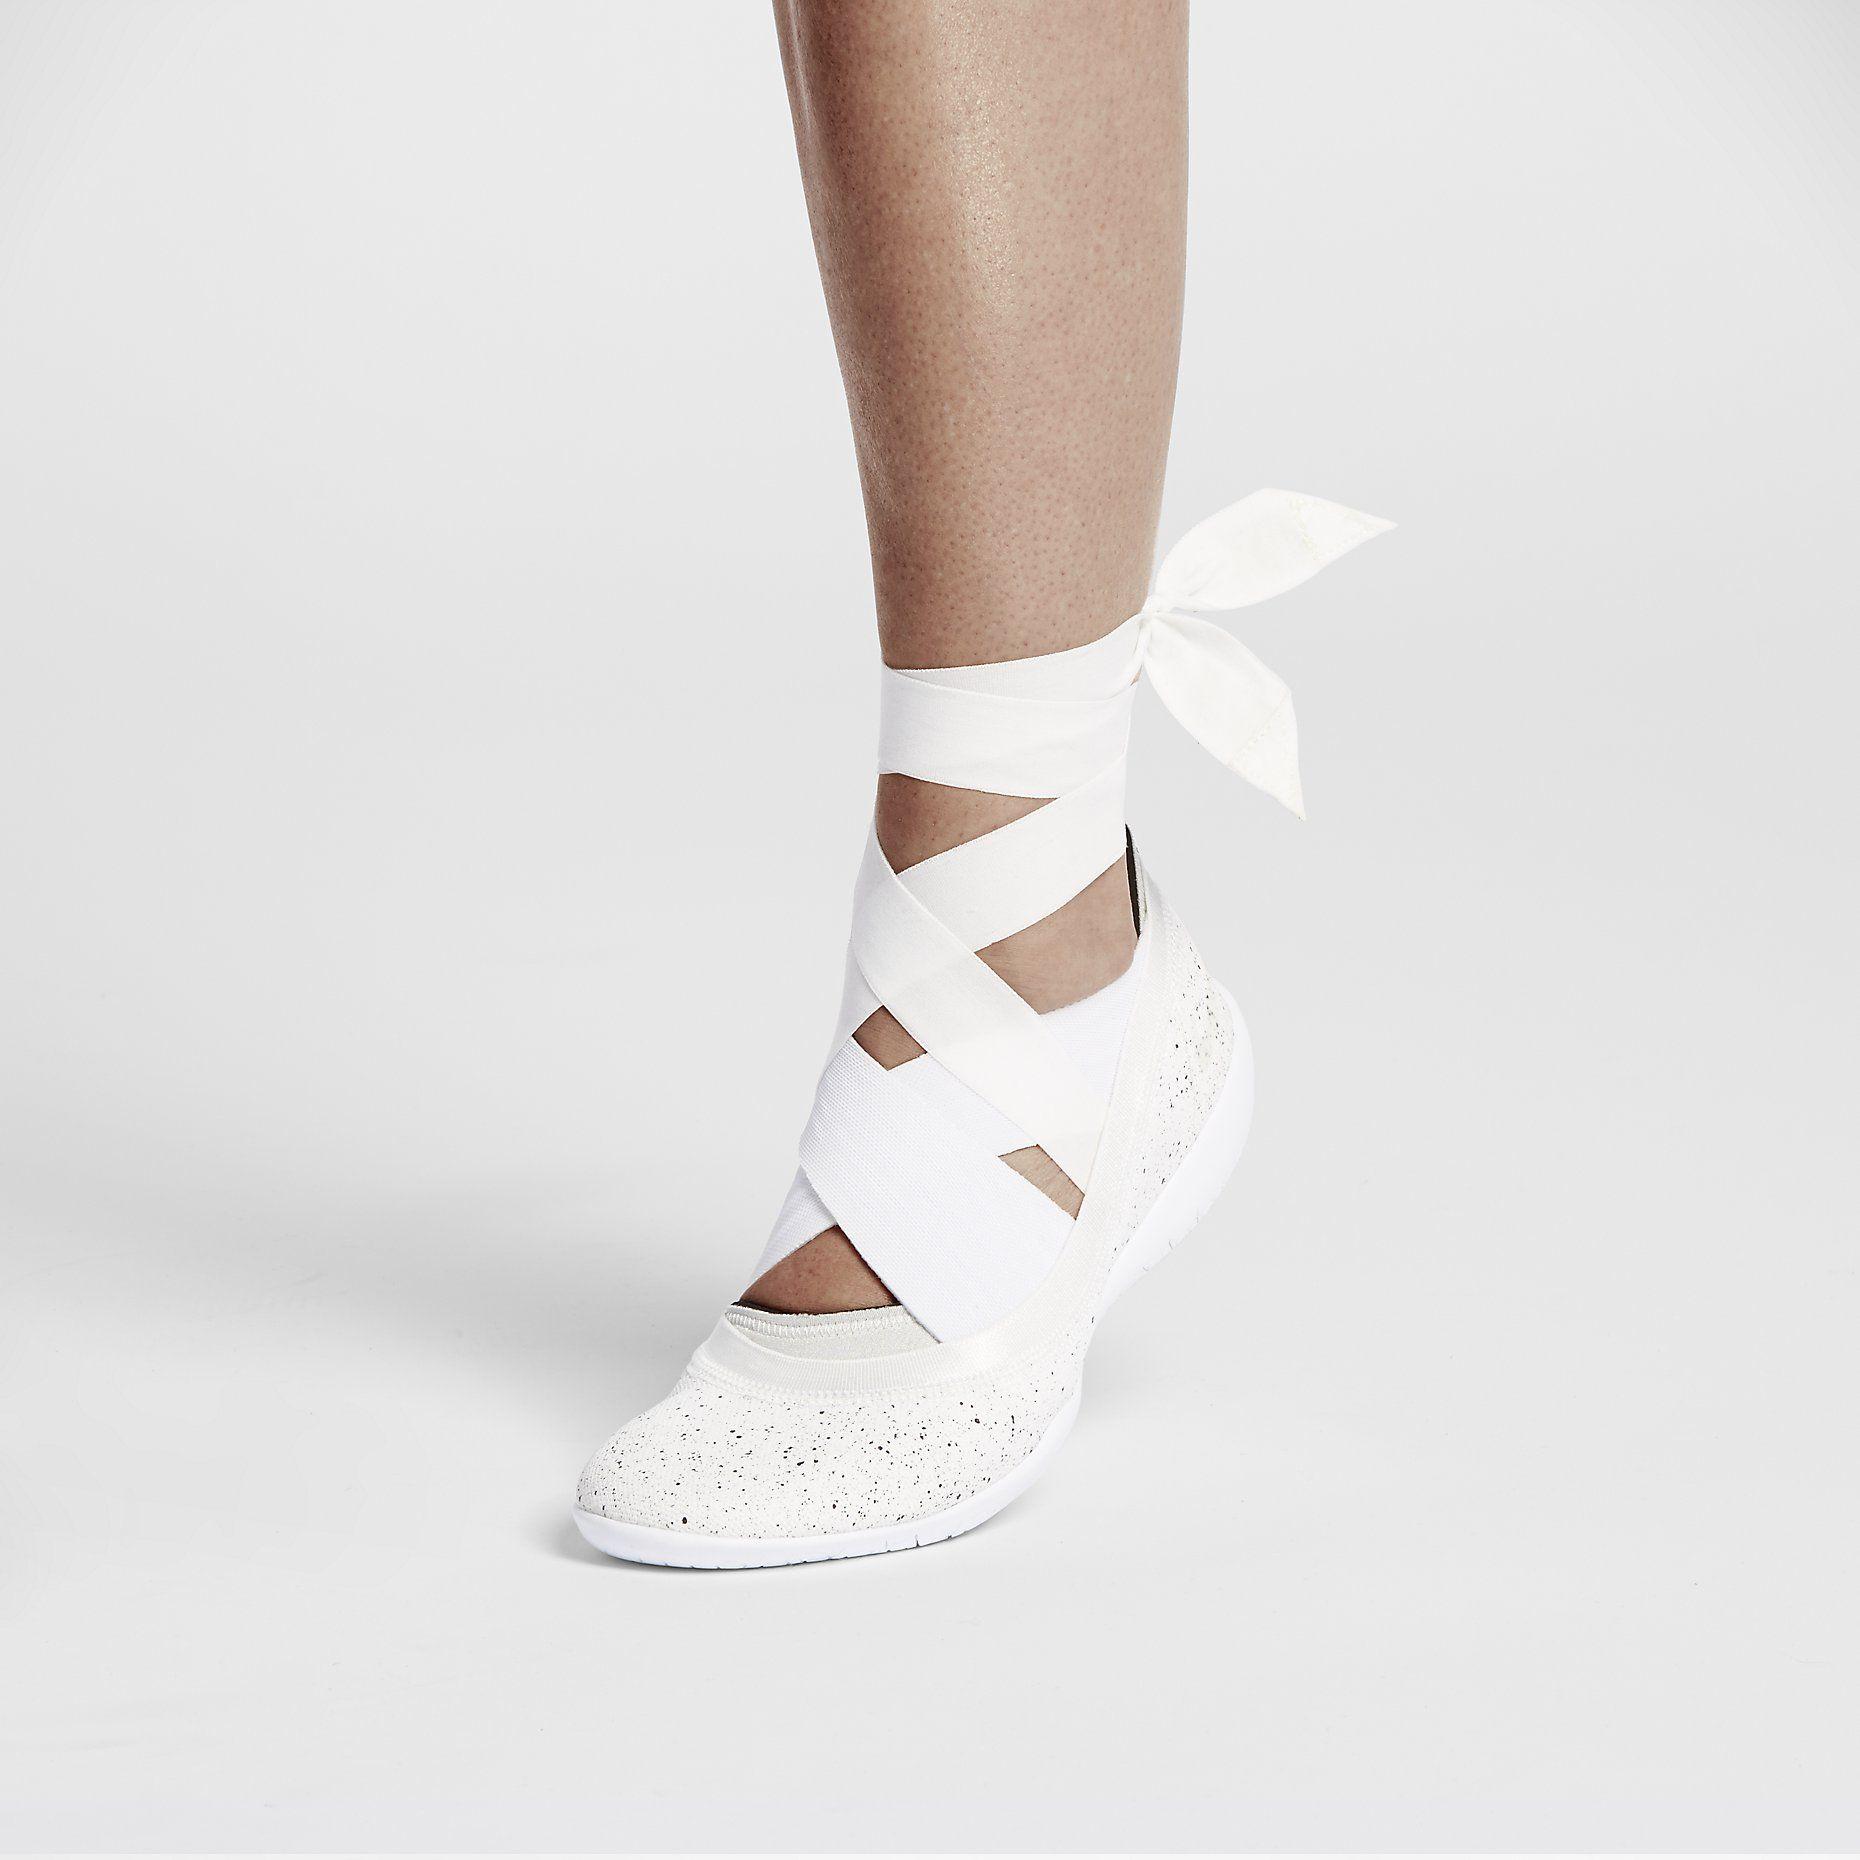 c44e5131aef NikeLab x JFS Studio Wrap Pack 3 Three-Part Footwear System. Nike Store